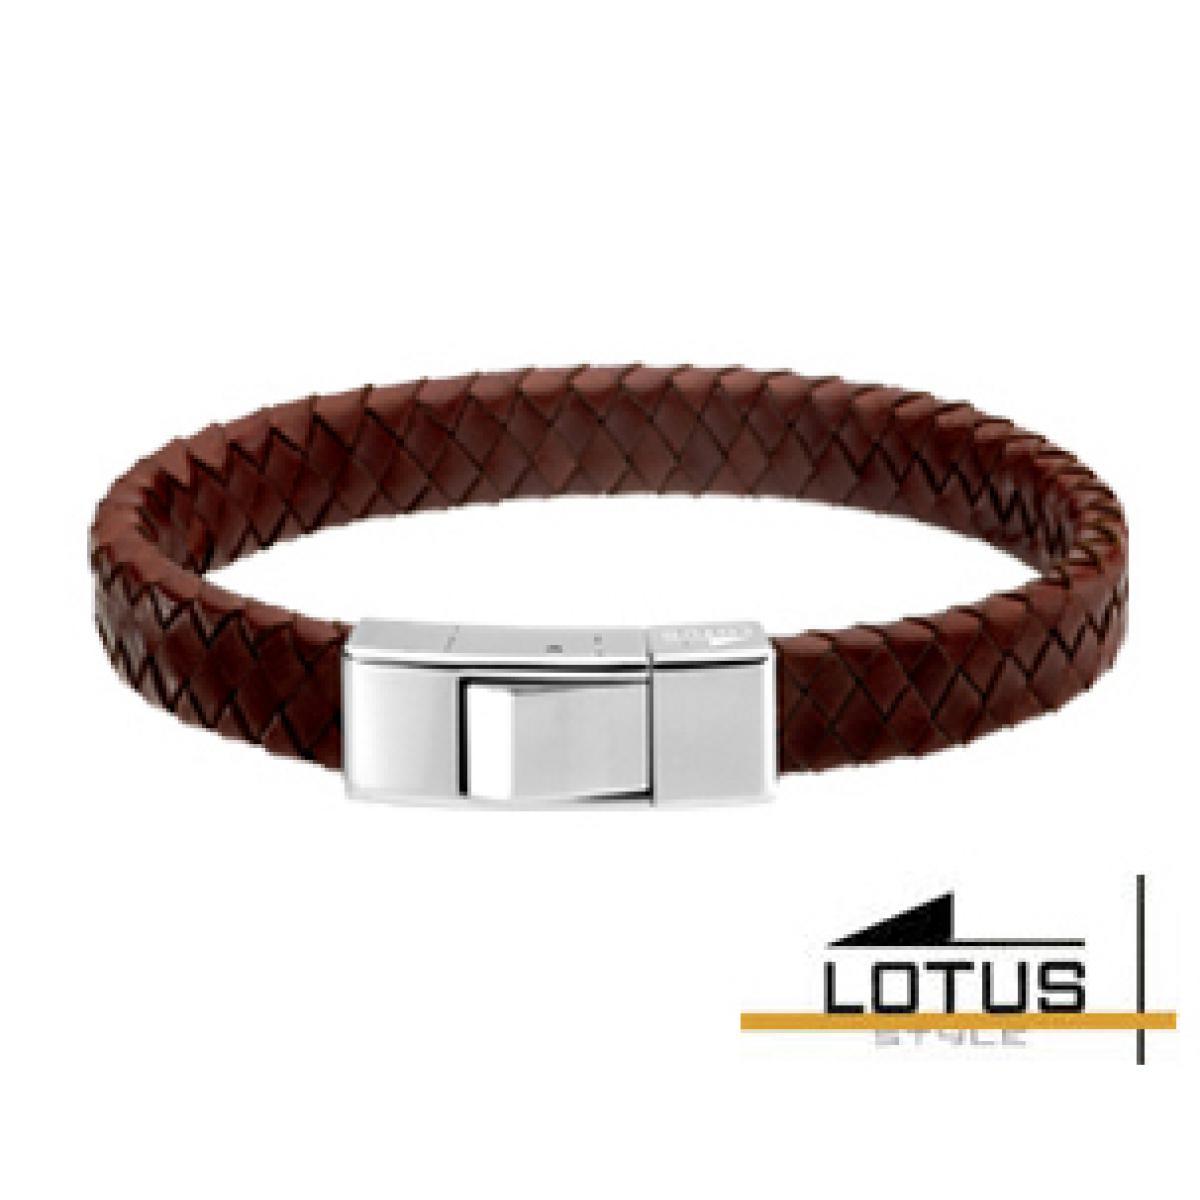 Bracelet Lotus Style - ls1122-2-3 - Modalova